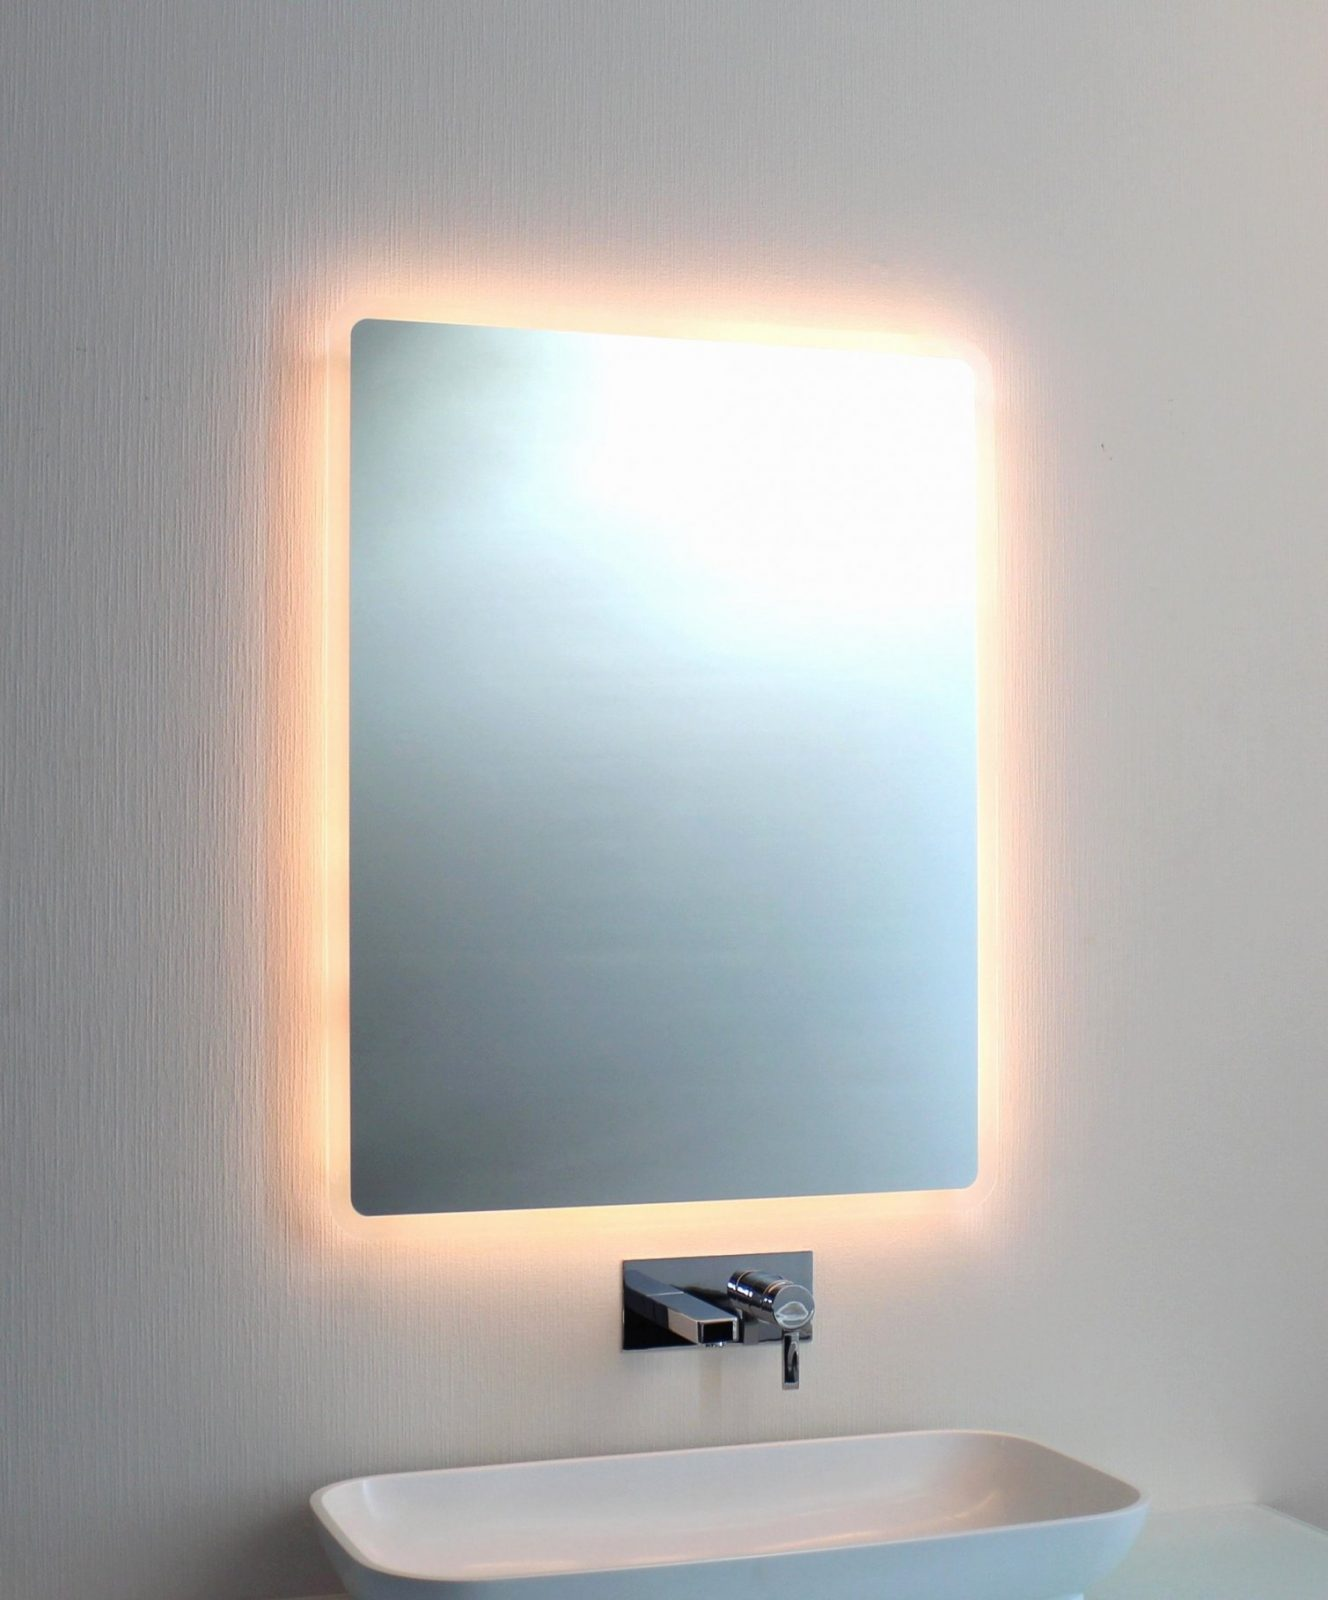 Spiegel Met Licht Ikea Elegant Schminktisch Mit Beleuchtung Ikea von Spiegel Mit Beleuchtung Ikea Photo